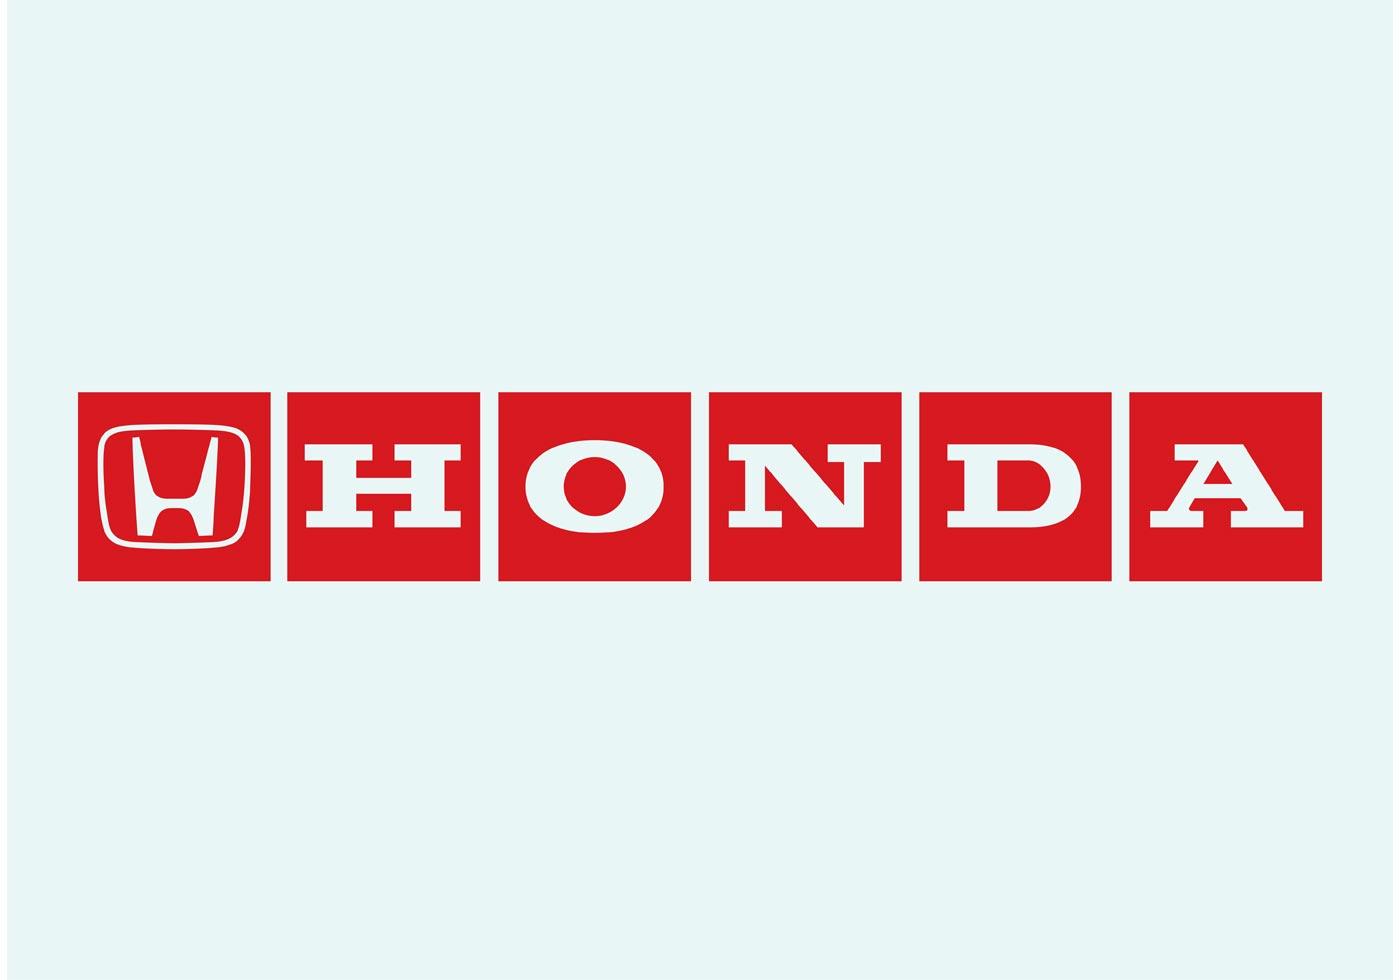 Honda Logo - Download Free Vector Art, Stock Graphics & Images Honda Motorcycle Logo Vector